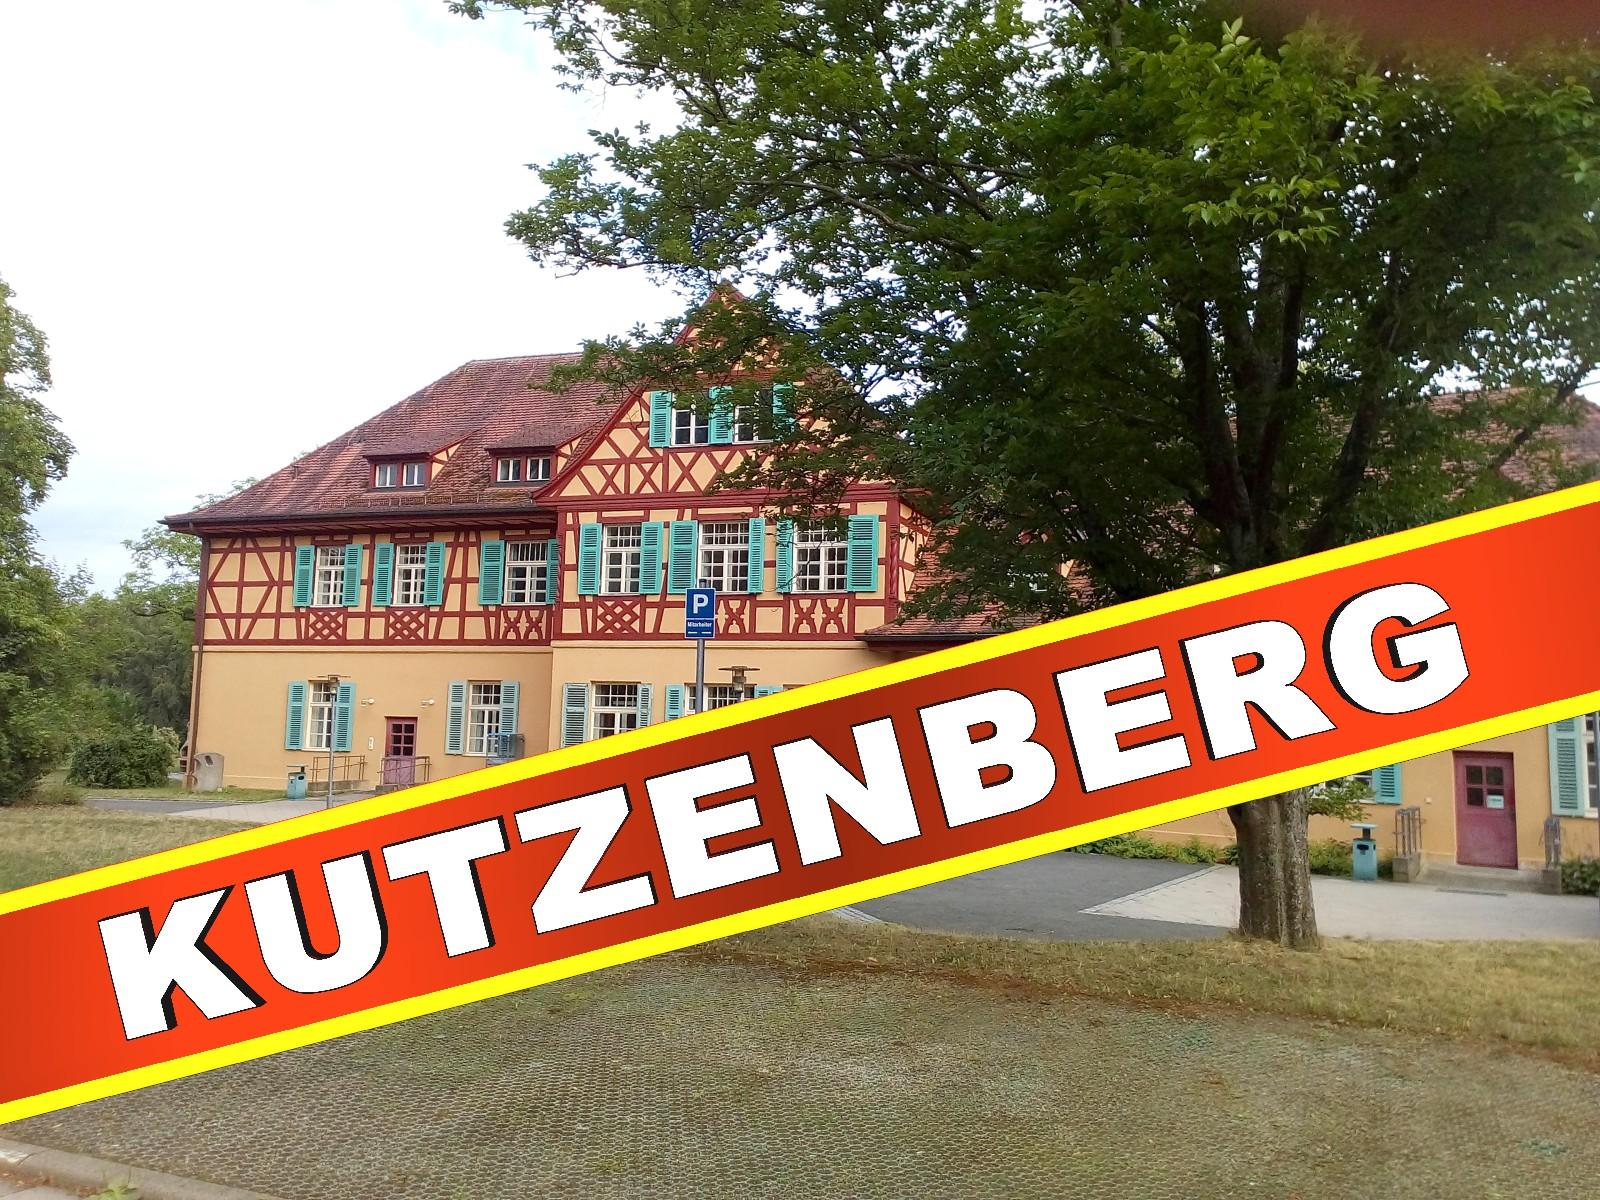 Bezirksklinikum Obermain Kutzenberg, 96250 Ebensfeld Psychiatrie Polizei Krankenhaus (36)